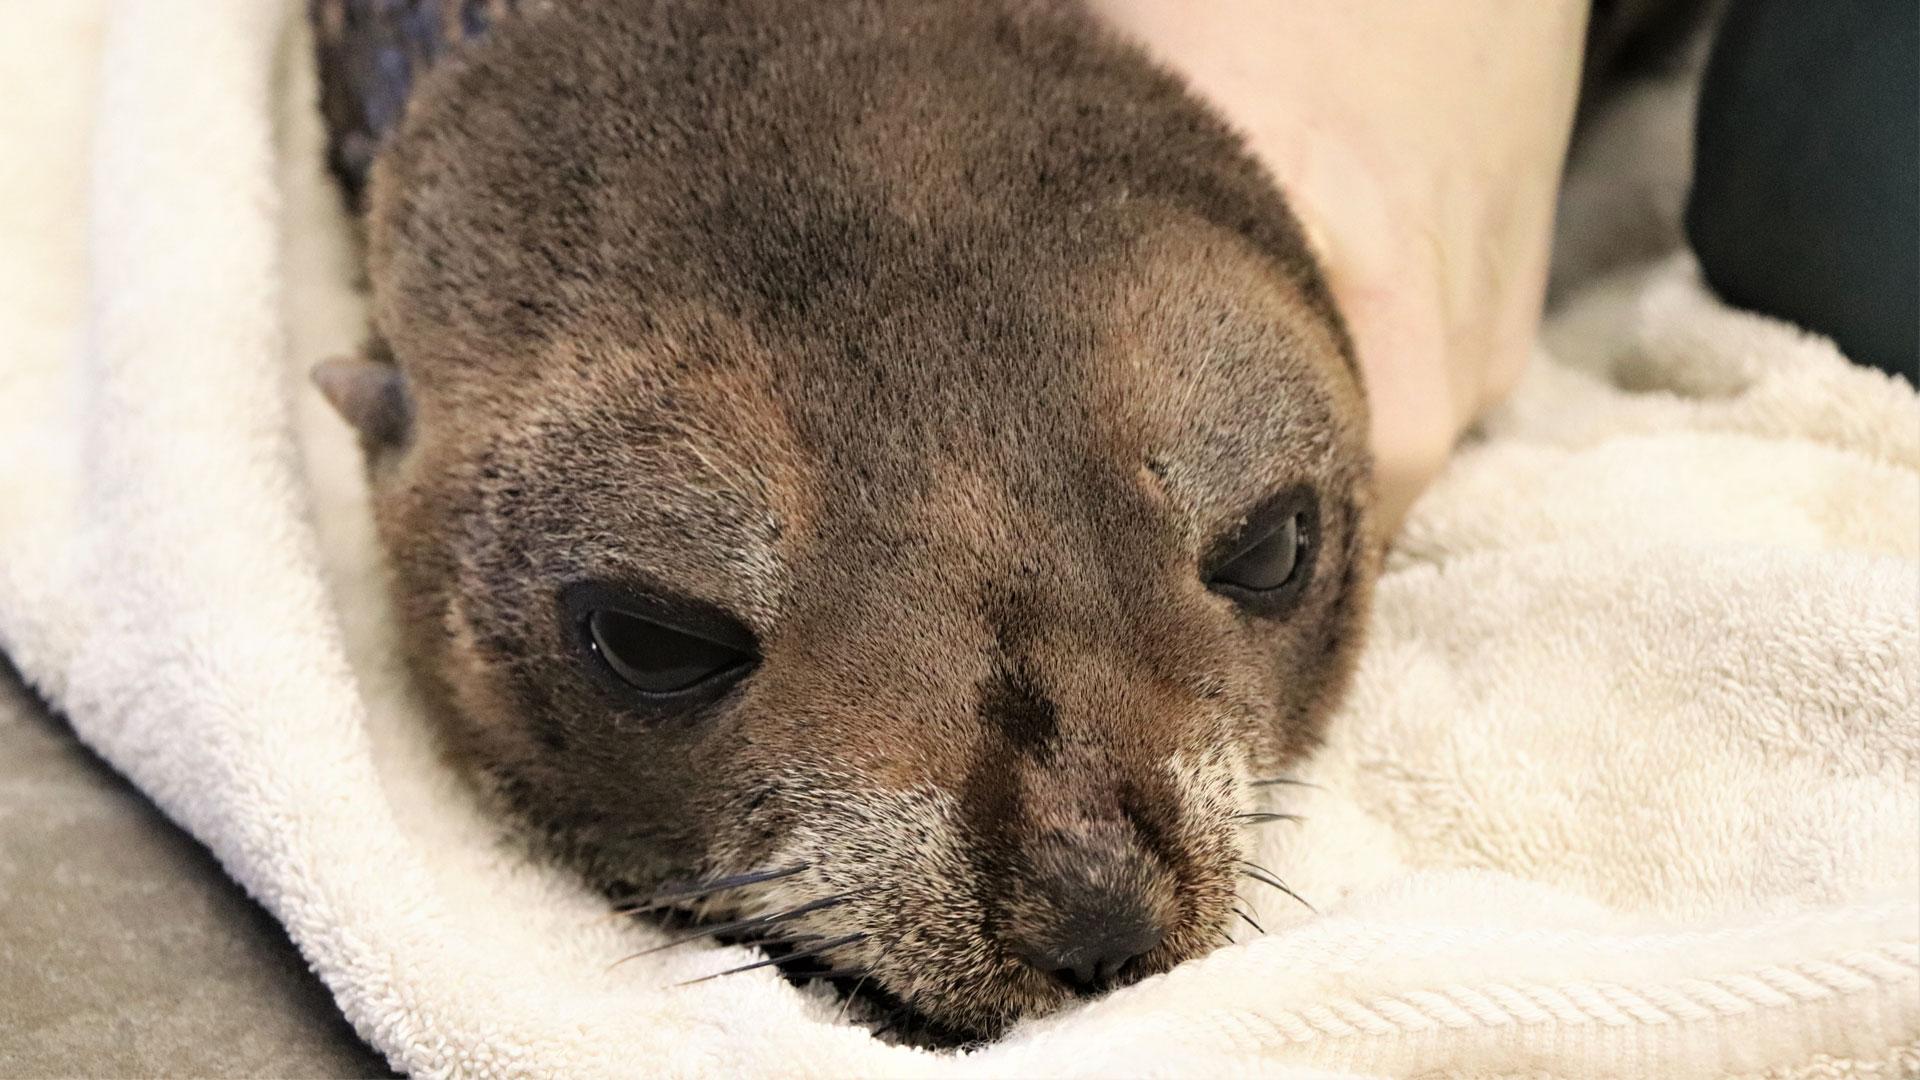 https://rfacdn.nz/zoo/assets/media/nz-fur-seal-gallery-4.jpg